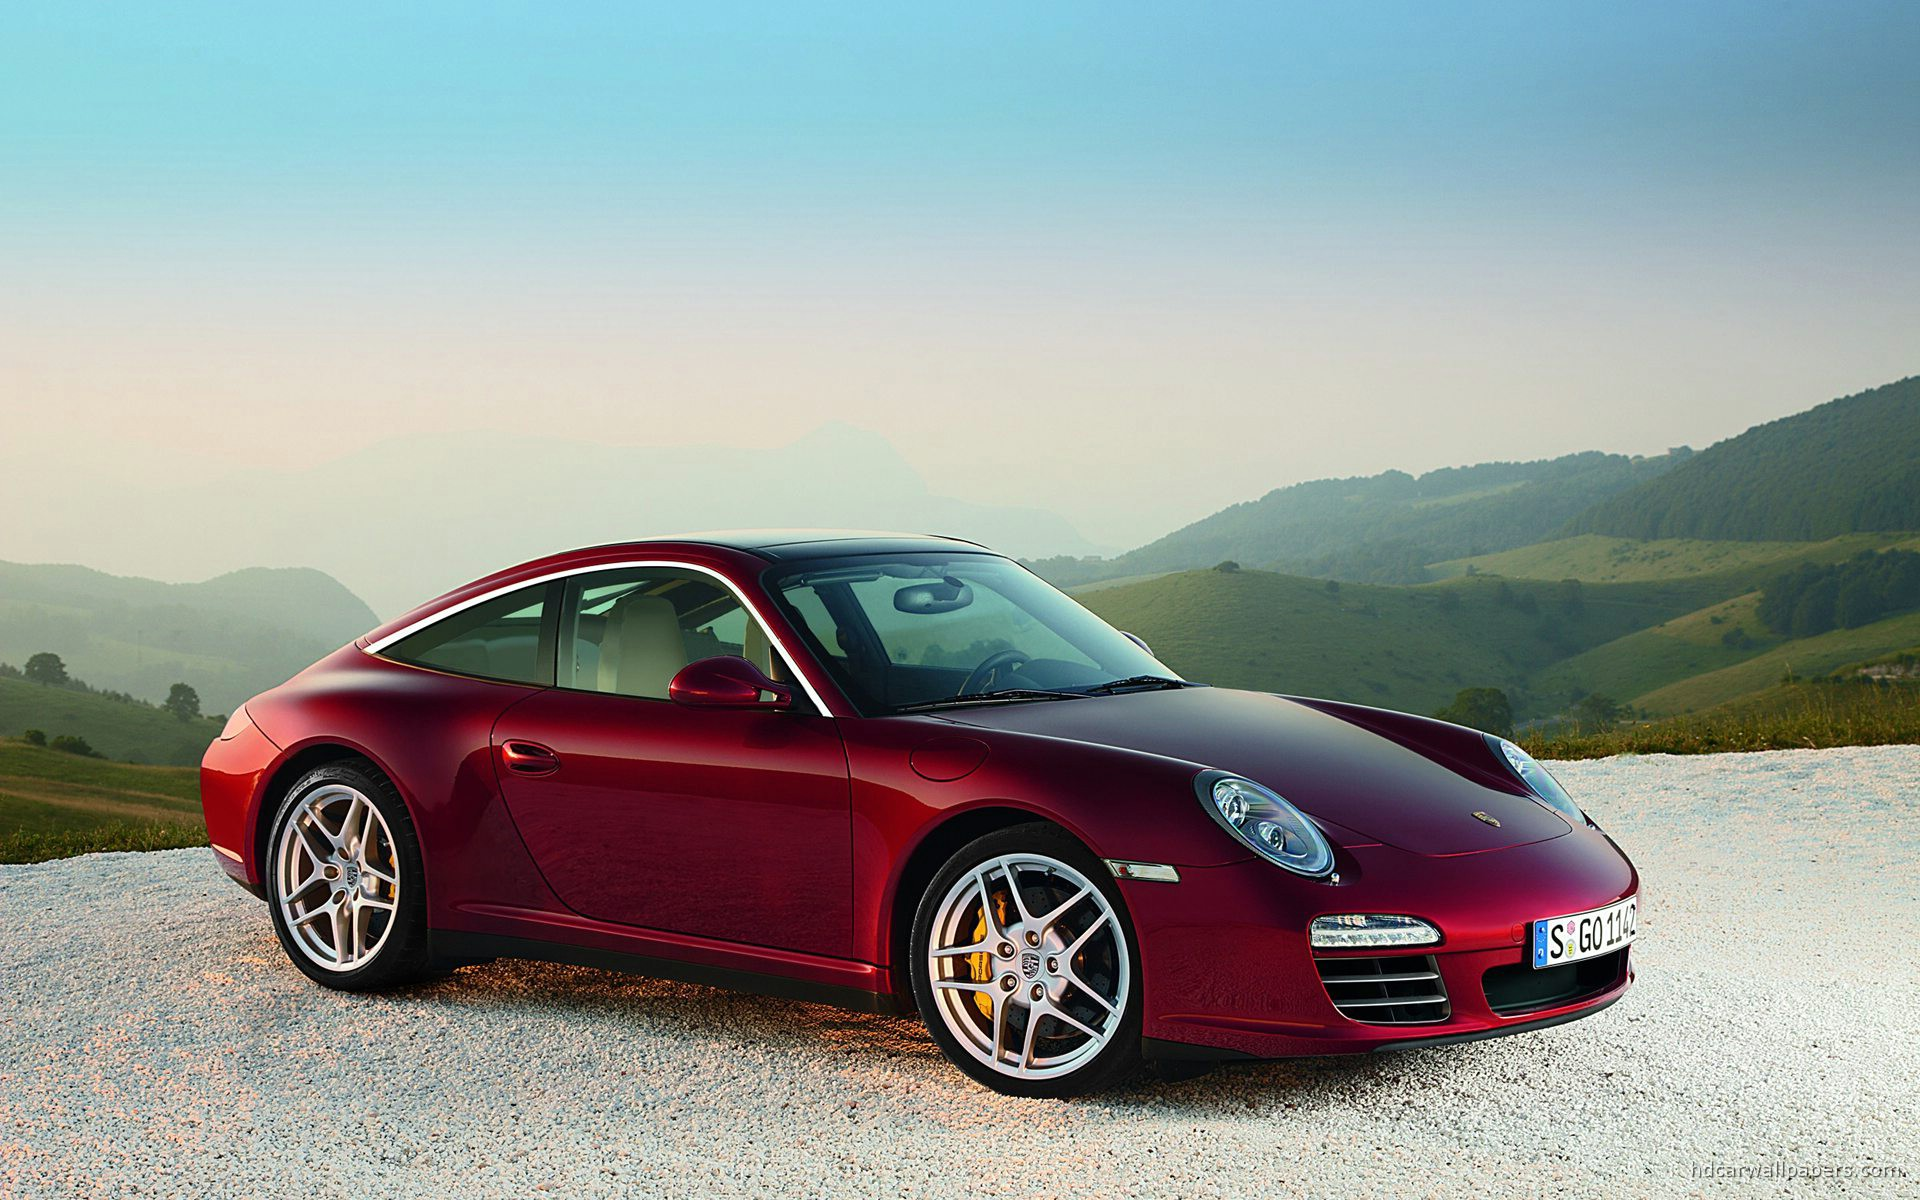 Porsche 911 Targa 4S Wallpapers HD Wallpapers 1920x1200